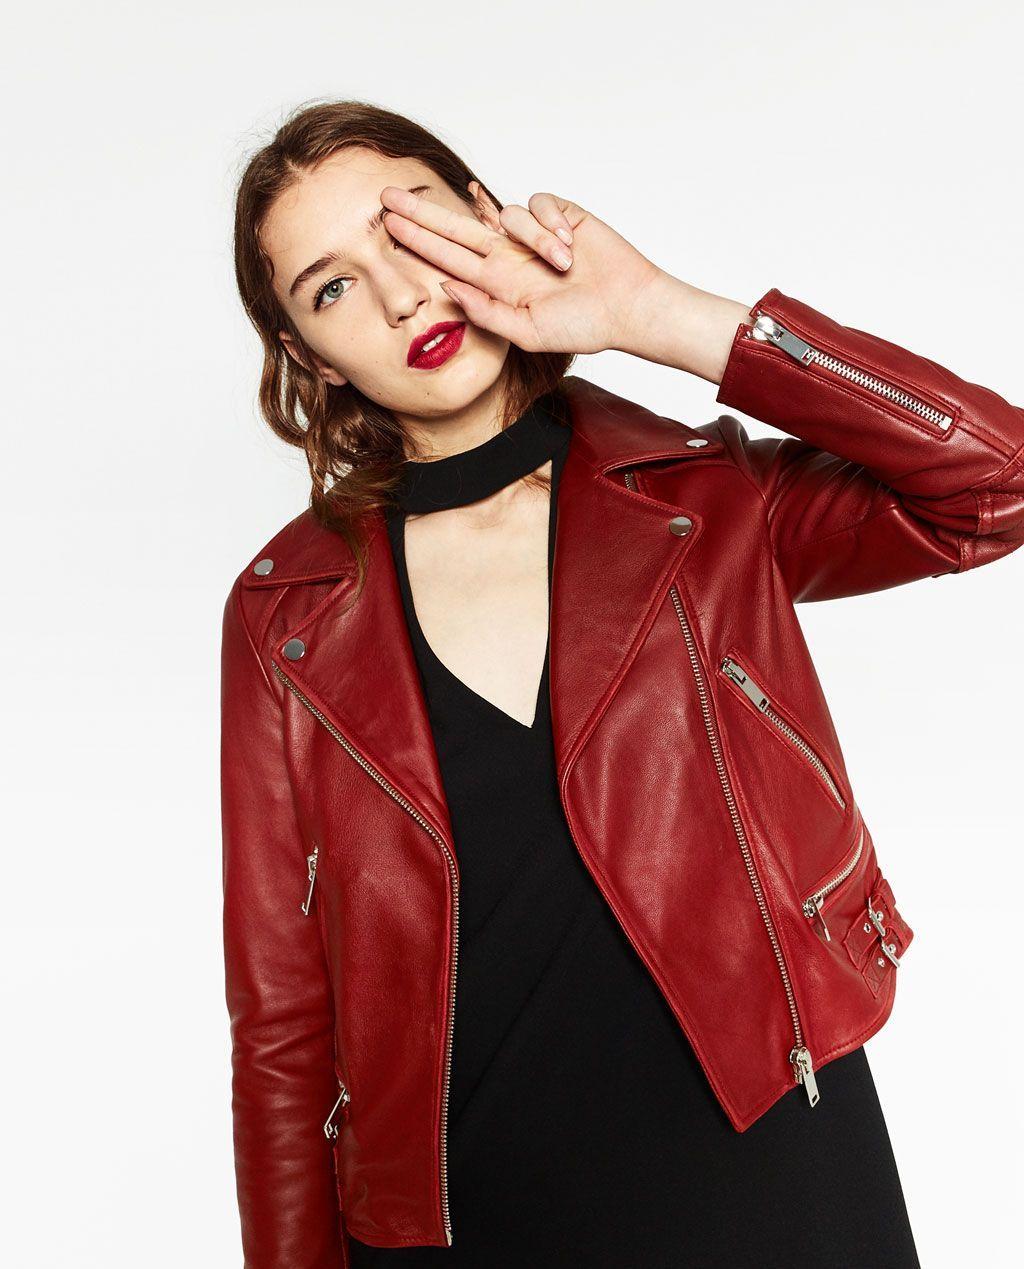 ZaraBusos Jackets Cuero Chaqueta De Outerwear Roja dQrotChBsx